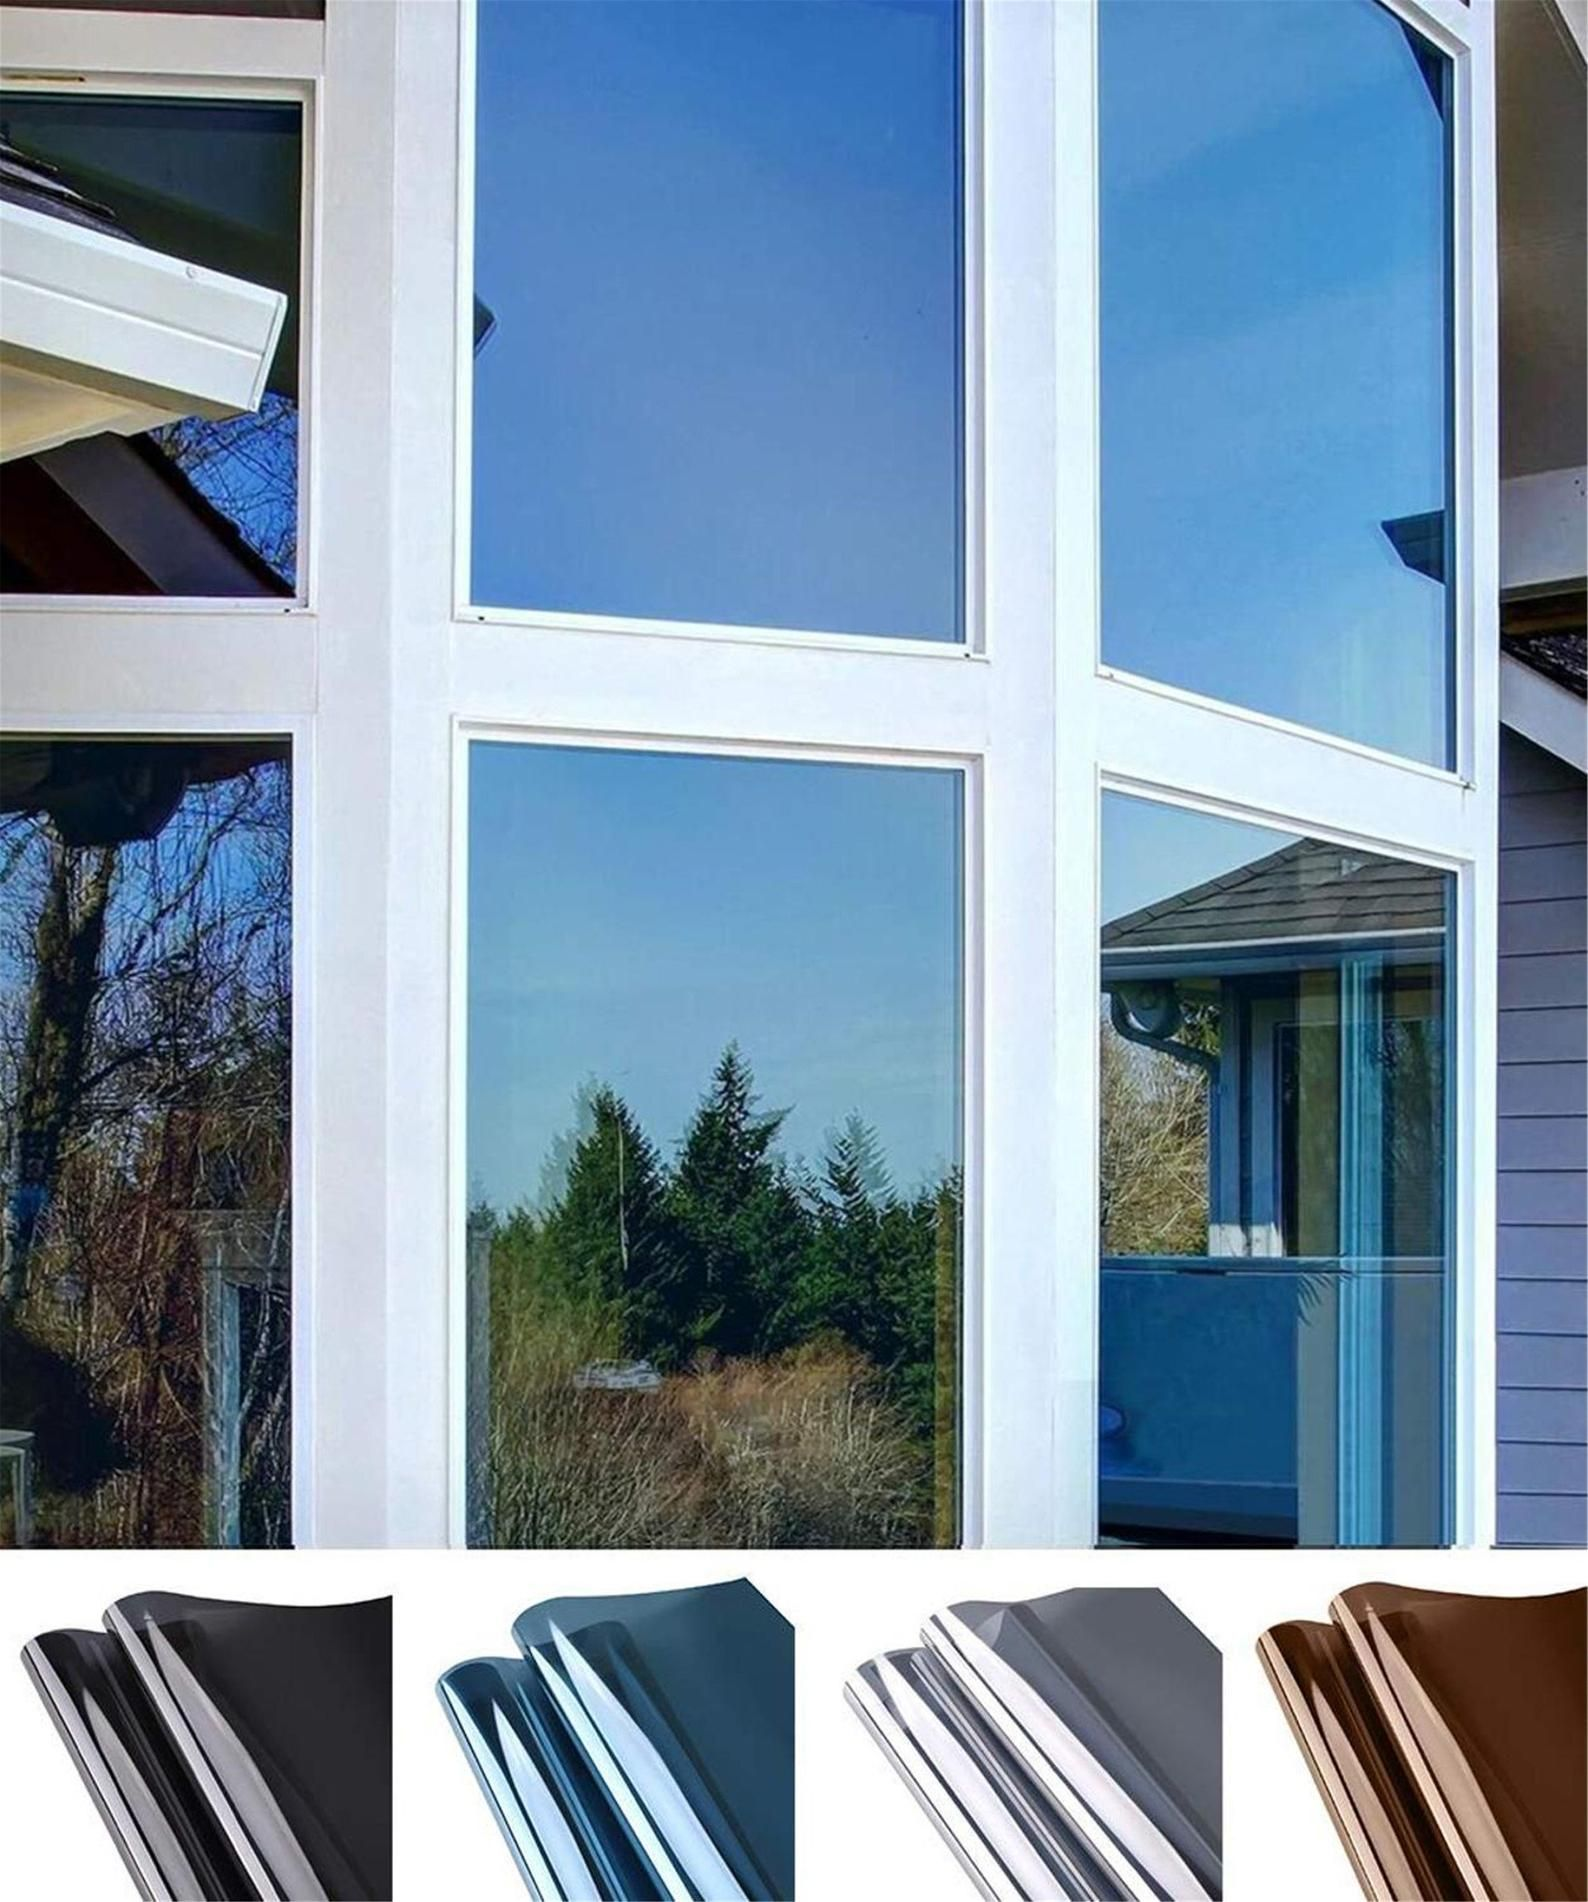 Window Privacy Film Sun Blocking Mirror Reflective Tint Heat Control Vinyl Anti Uv Window Stickers For Home And Office Window Film Privacy Window Privacy Mirror Window Film [ jpg ]